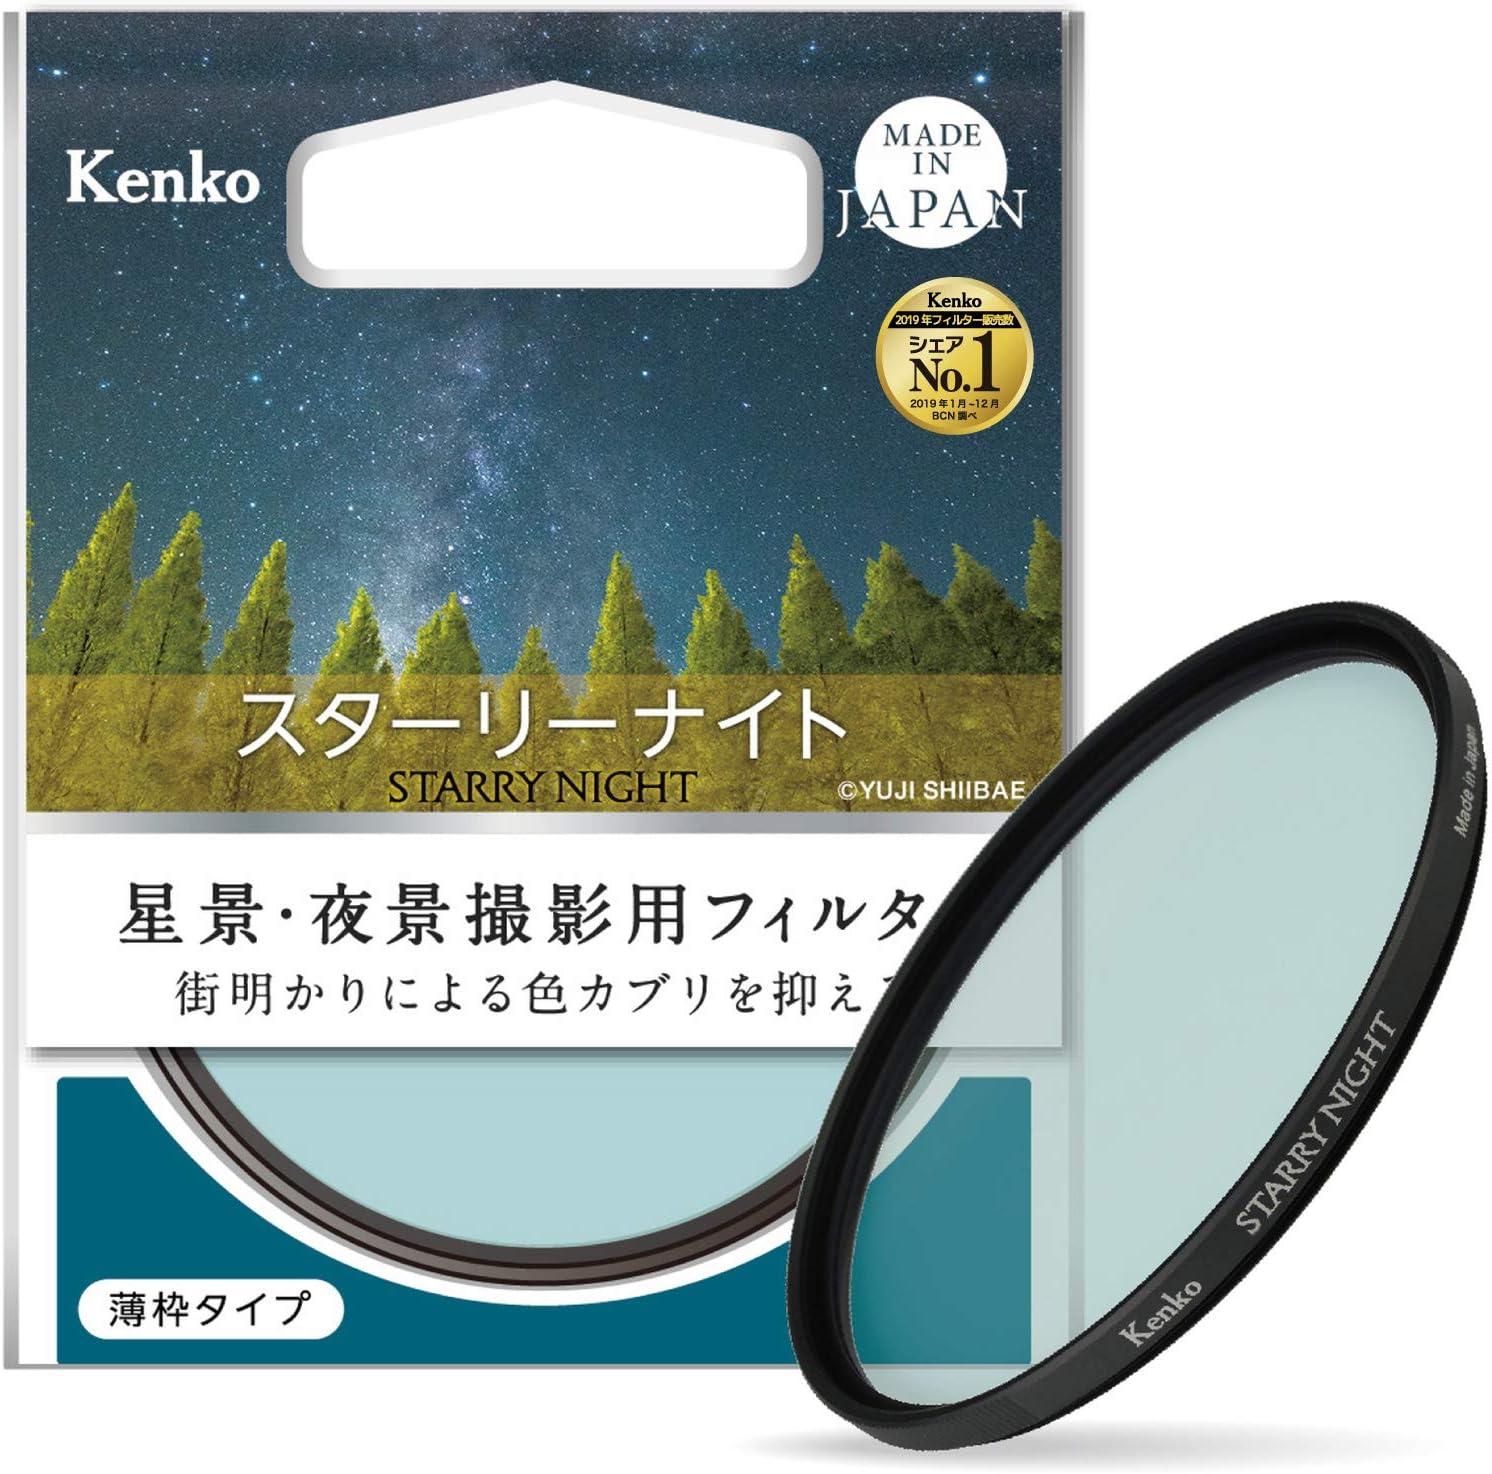 Kenko レンズフィルター スターリーナイト